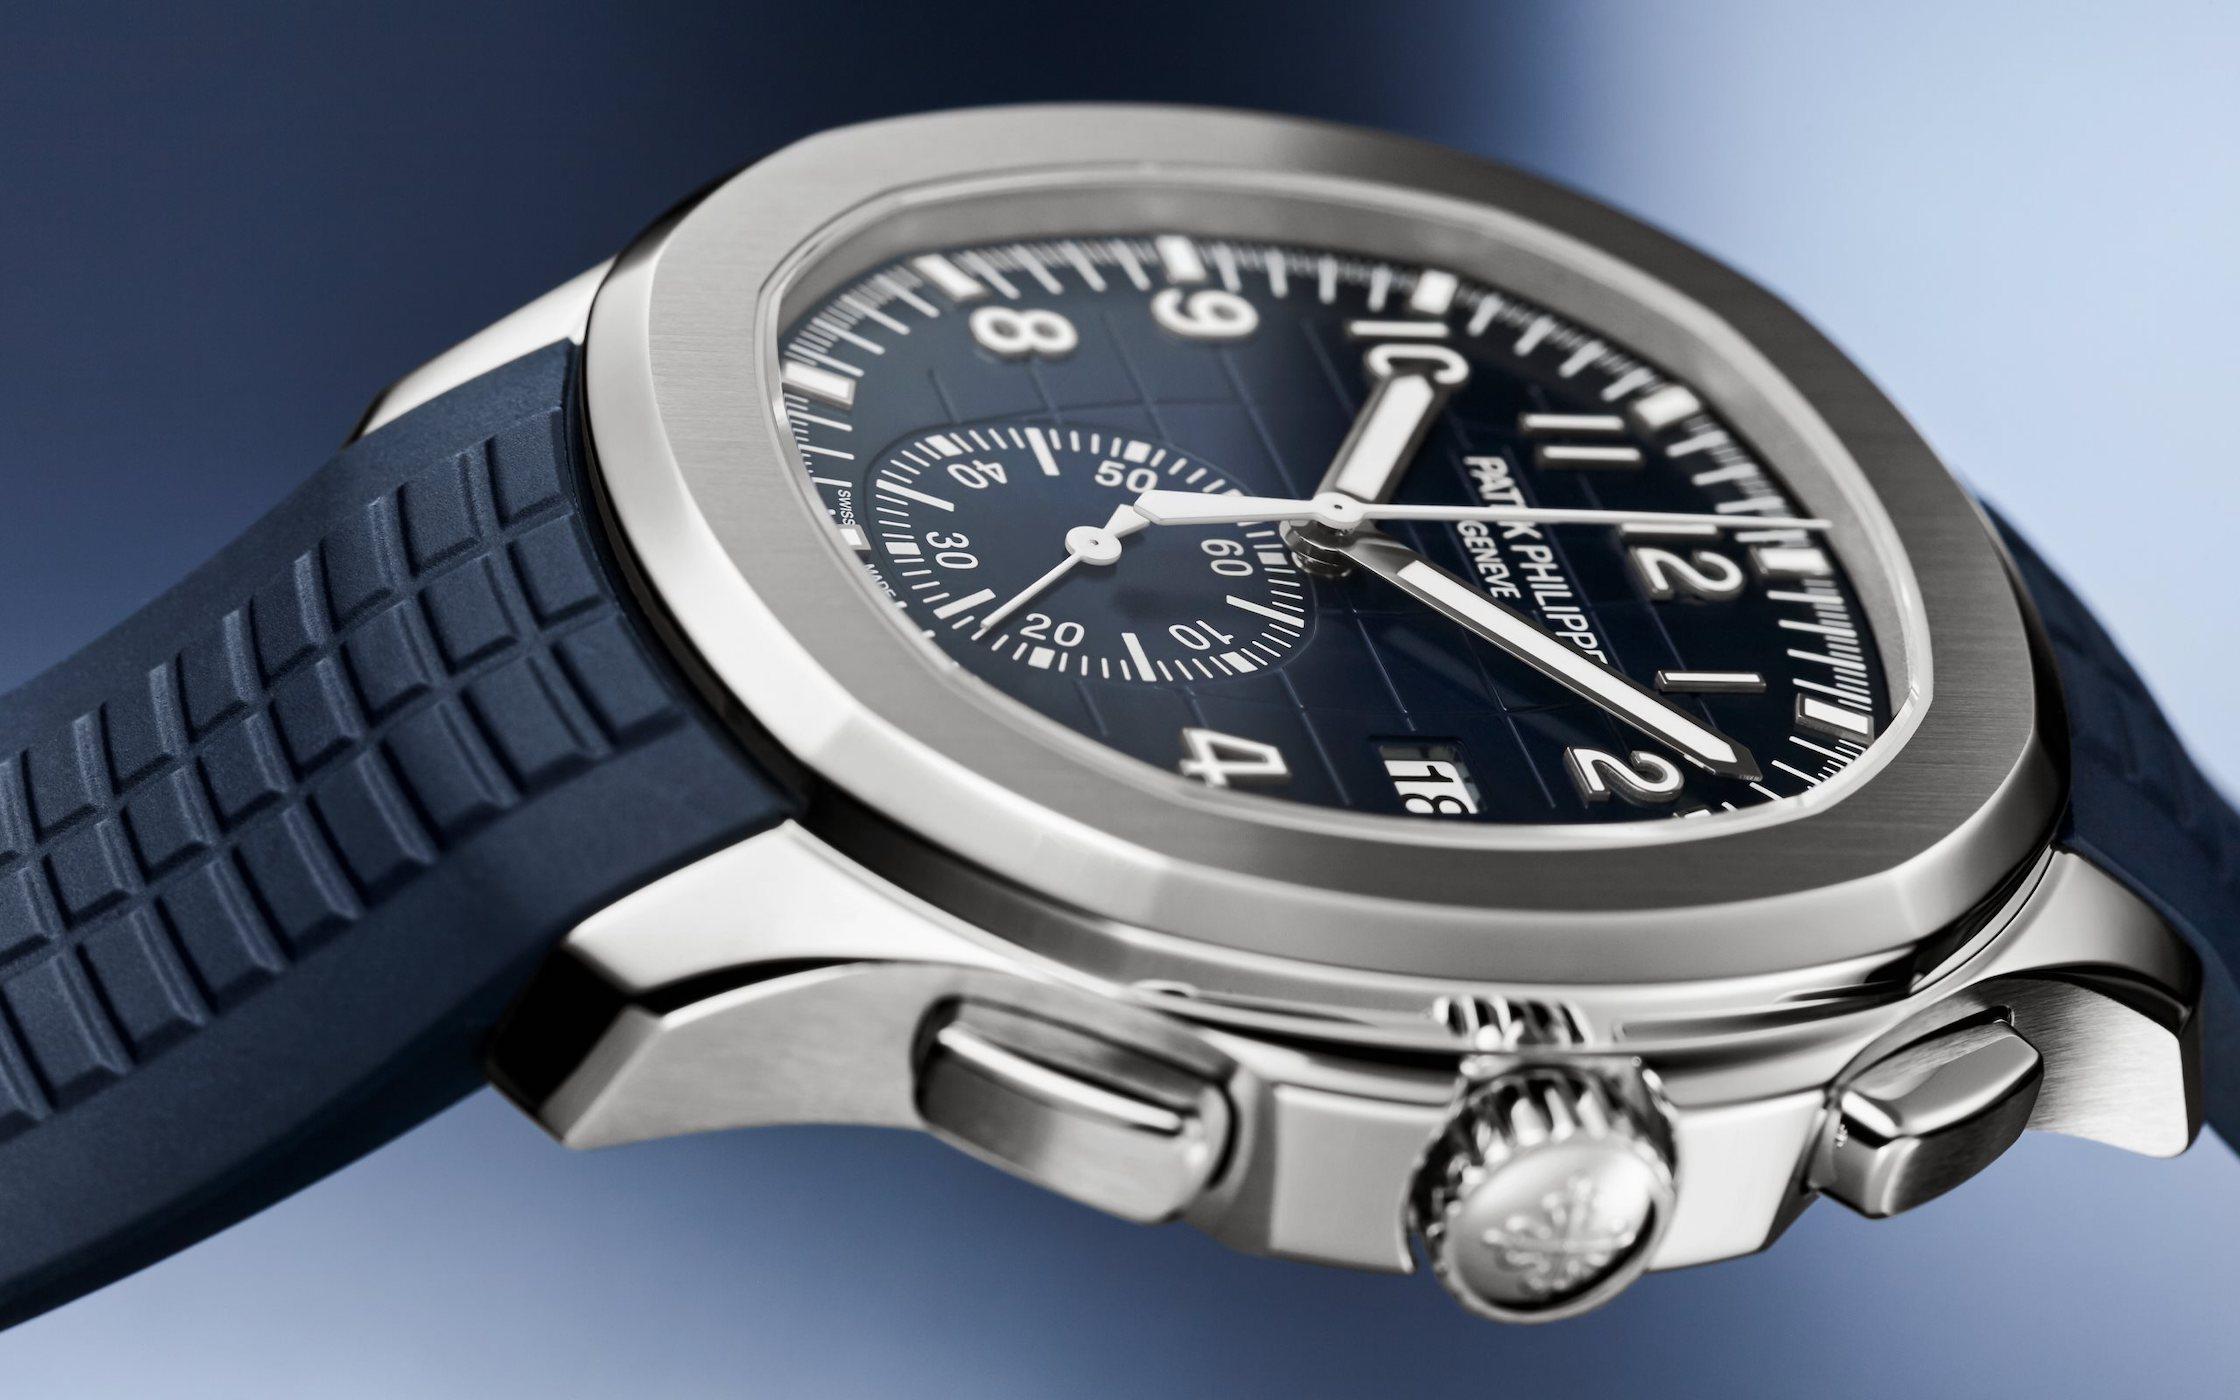 2021 Patek Philippe Aquanaut Chronograph 5968G-001 White gold blue dial